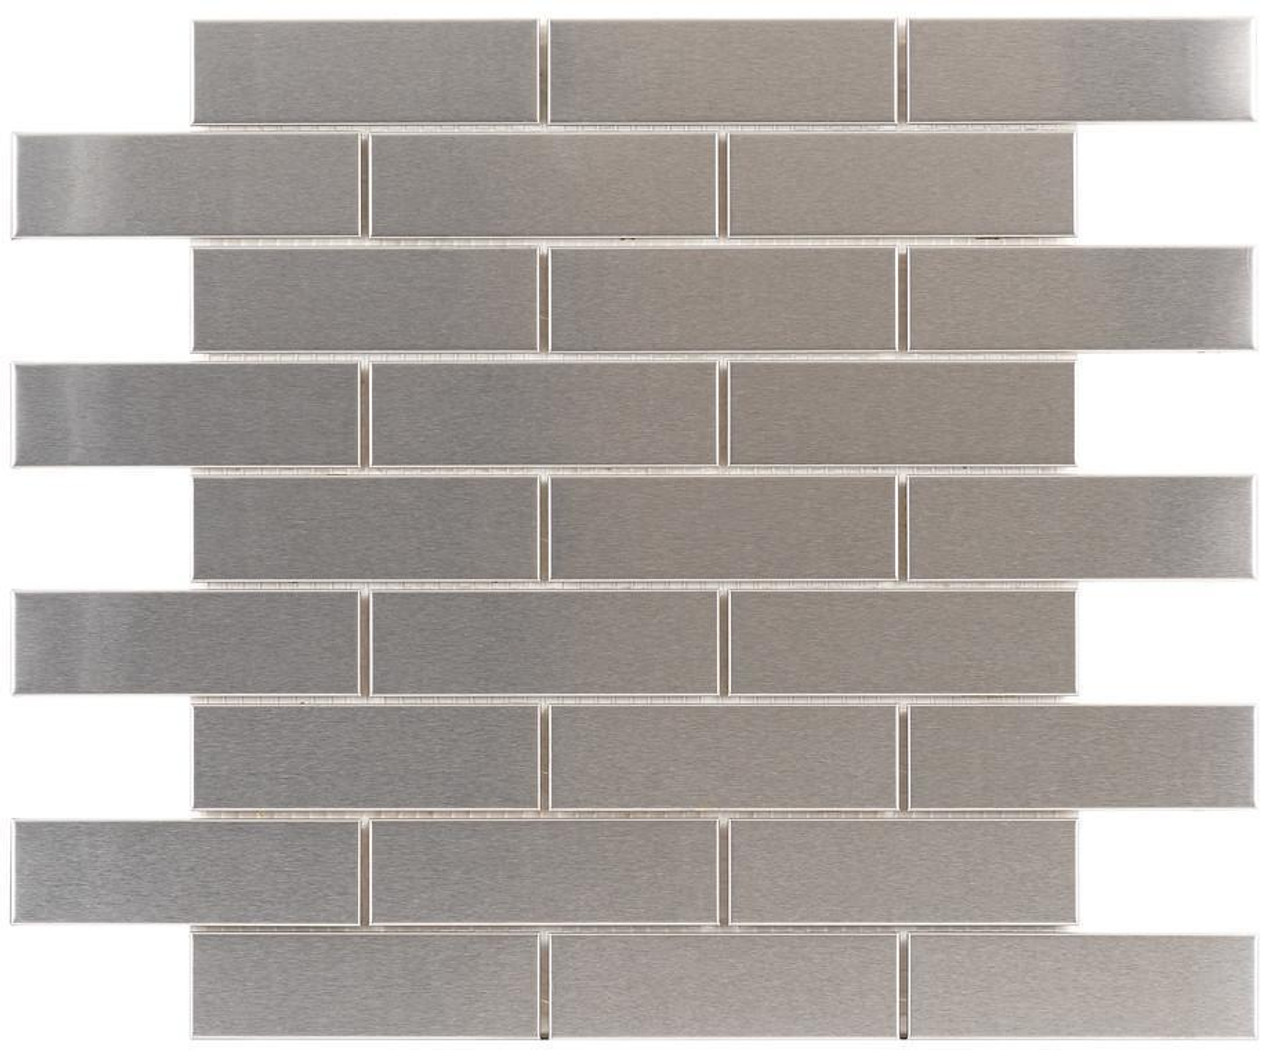 UBC Stainless Steel Tile Backsplash 1 x 4 Mosaic